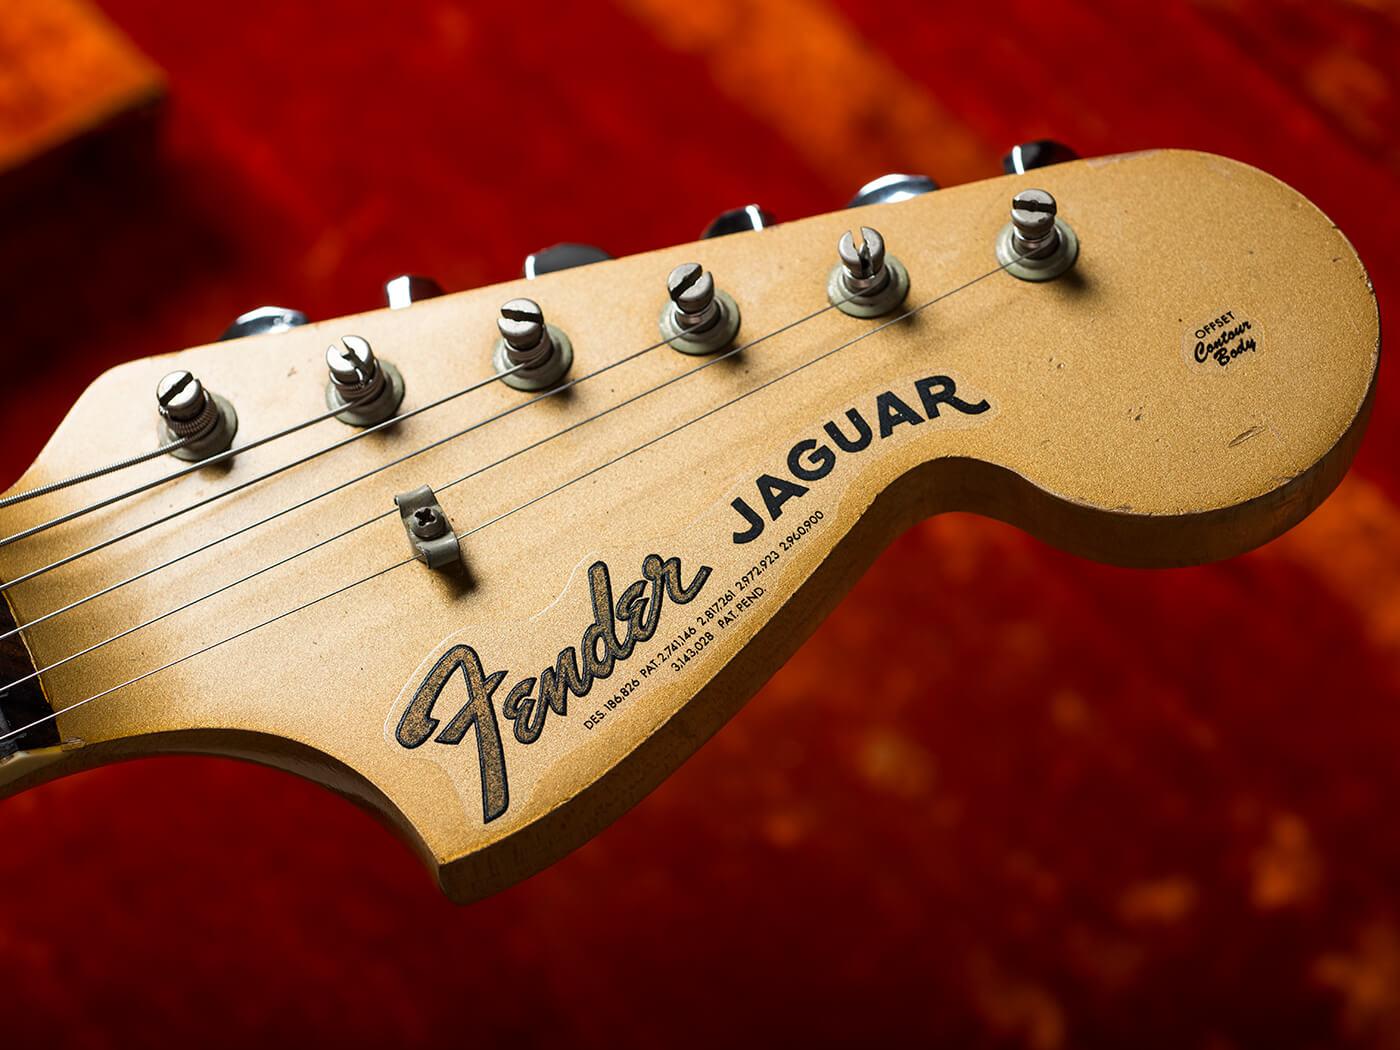 1966 Fender Jaguar Headstock